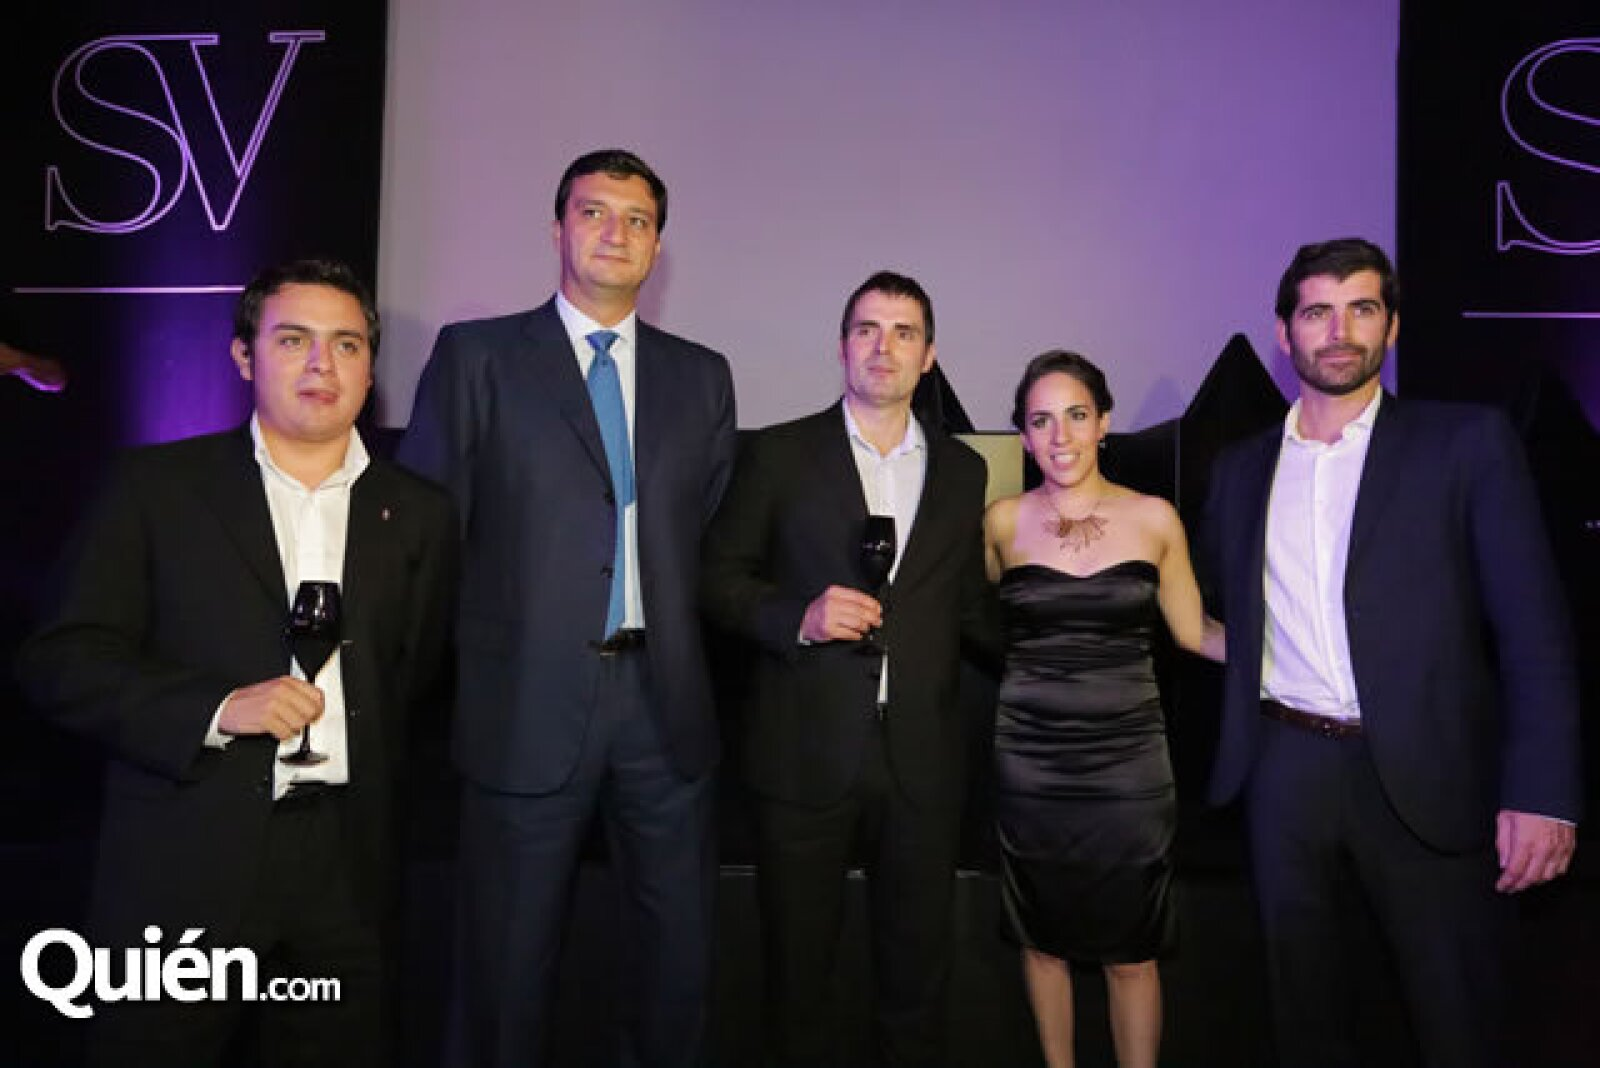 Jesús Flores, Francisco Garzón, Lluis Raventós Llopart, Bárbara Hagman y Arturo Peris